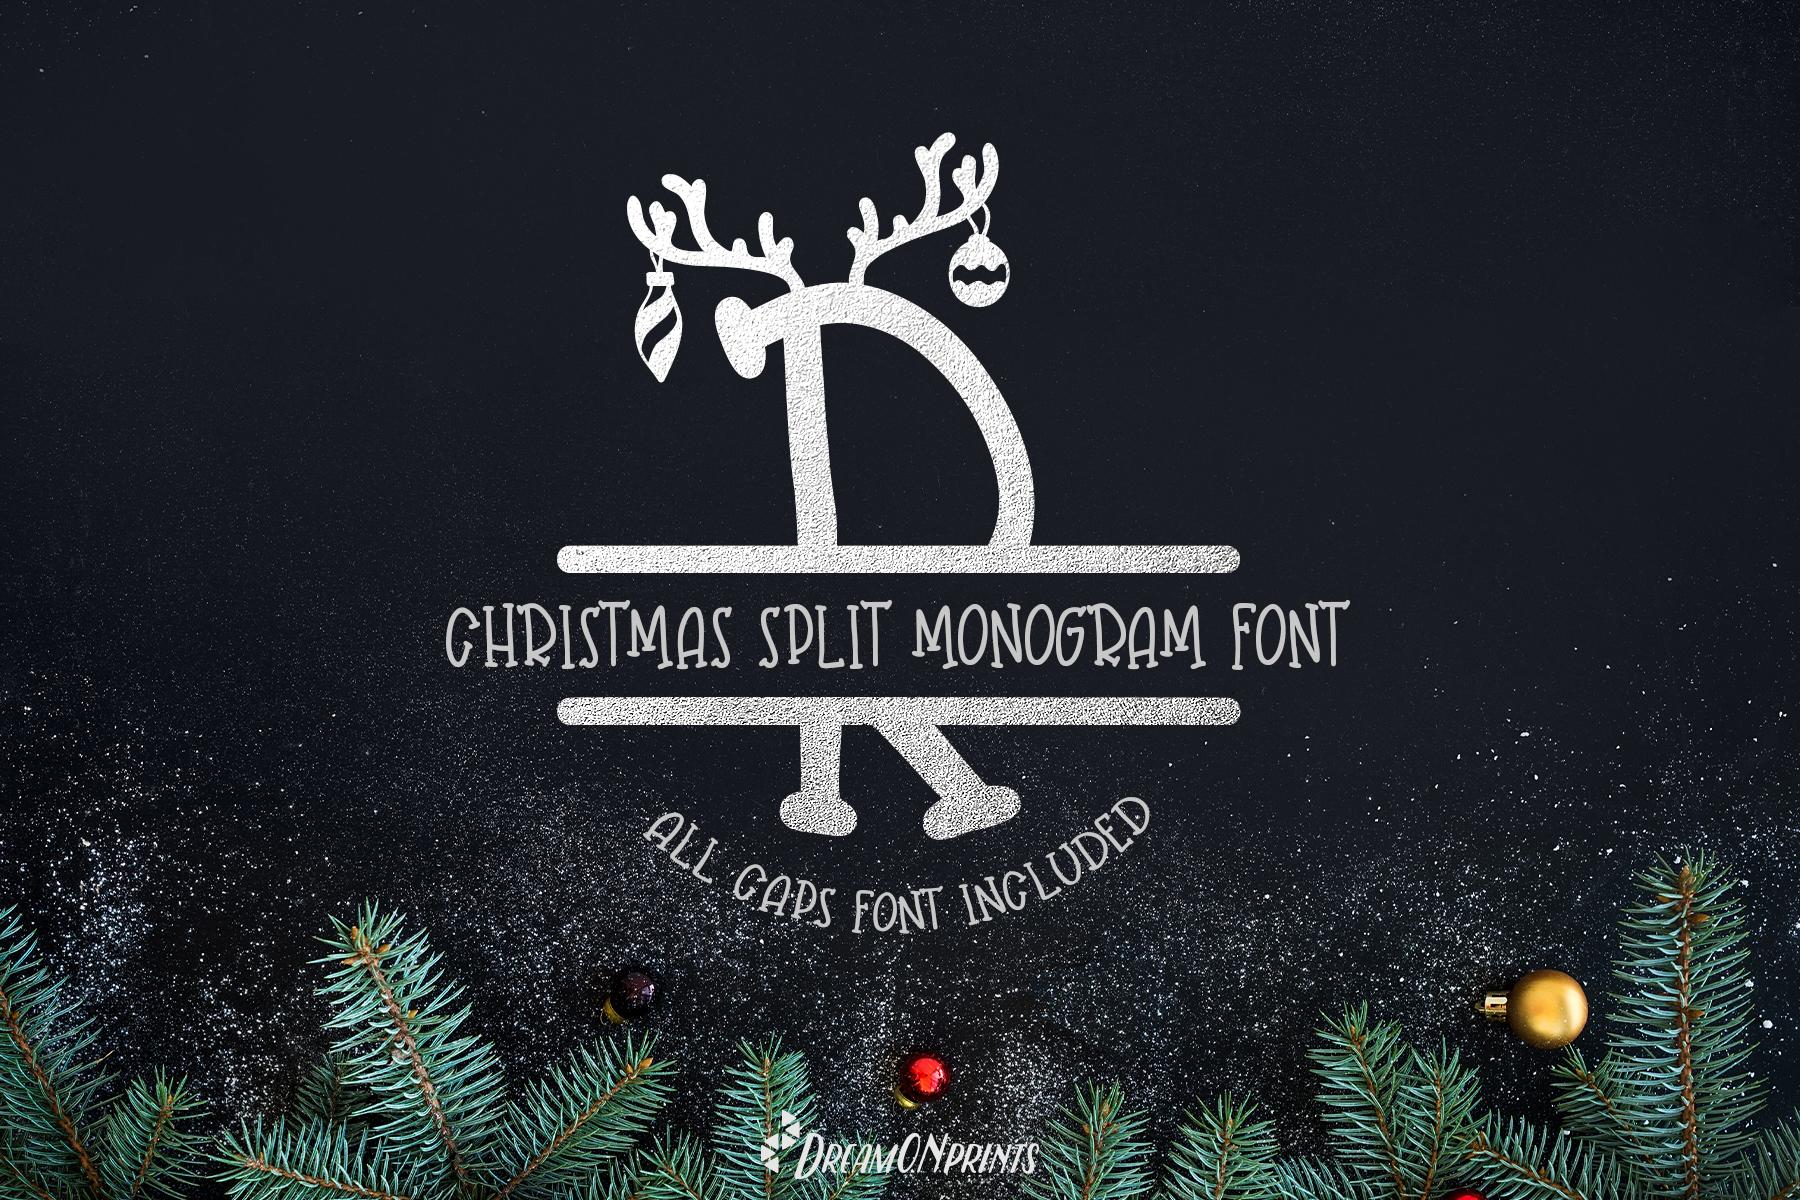 Reindeer Dust - Christmas Split Monogram Font example image 1